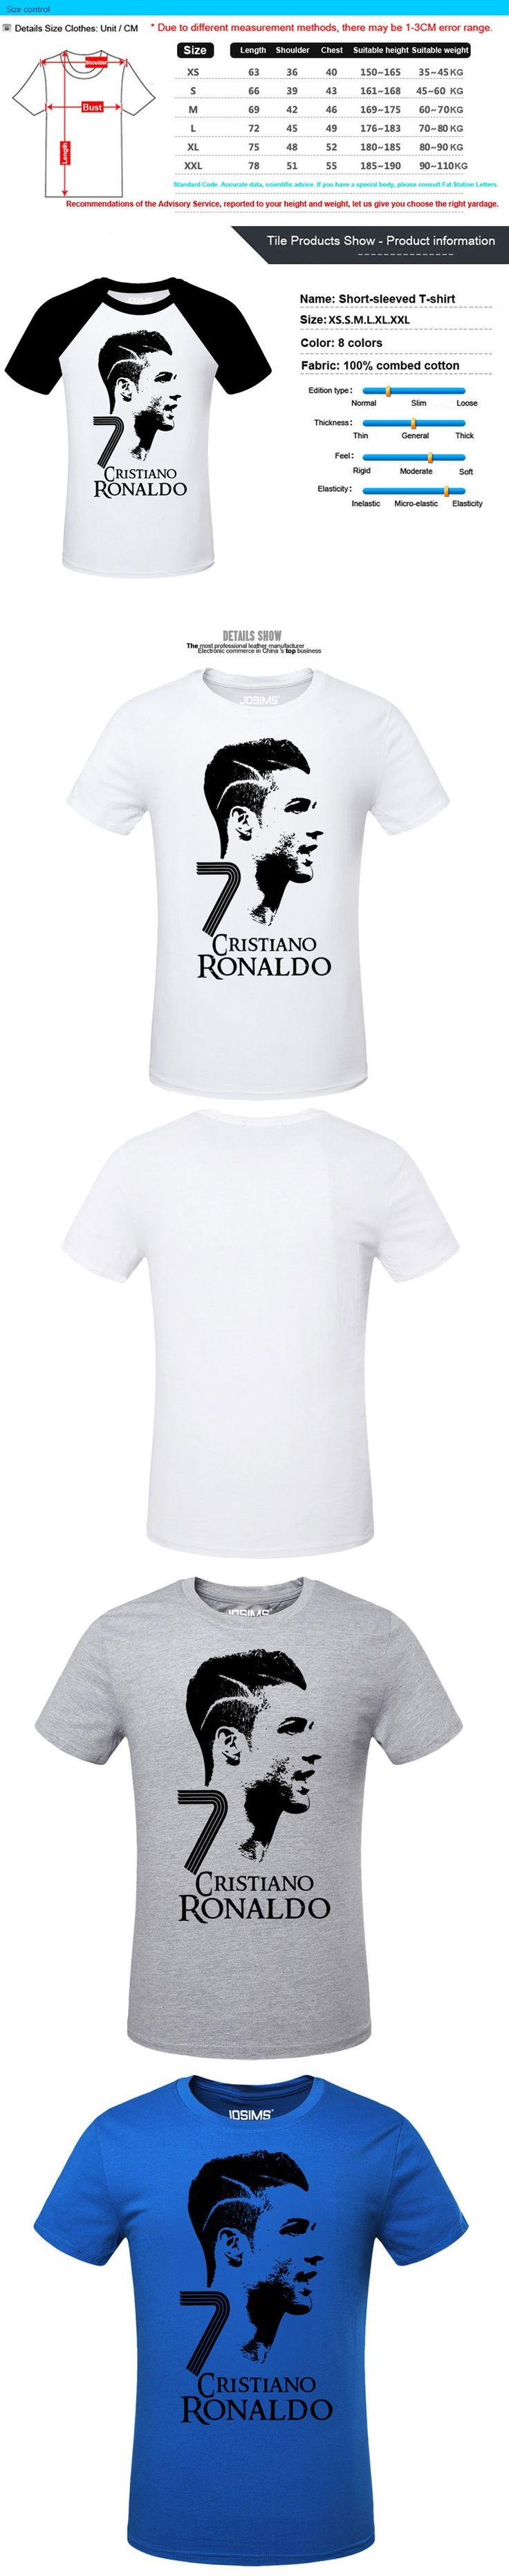 Decorative Buy A Cristiano Ronaldo T-shirt Real Madrid Cotton Tshirt